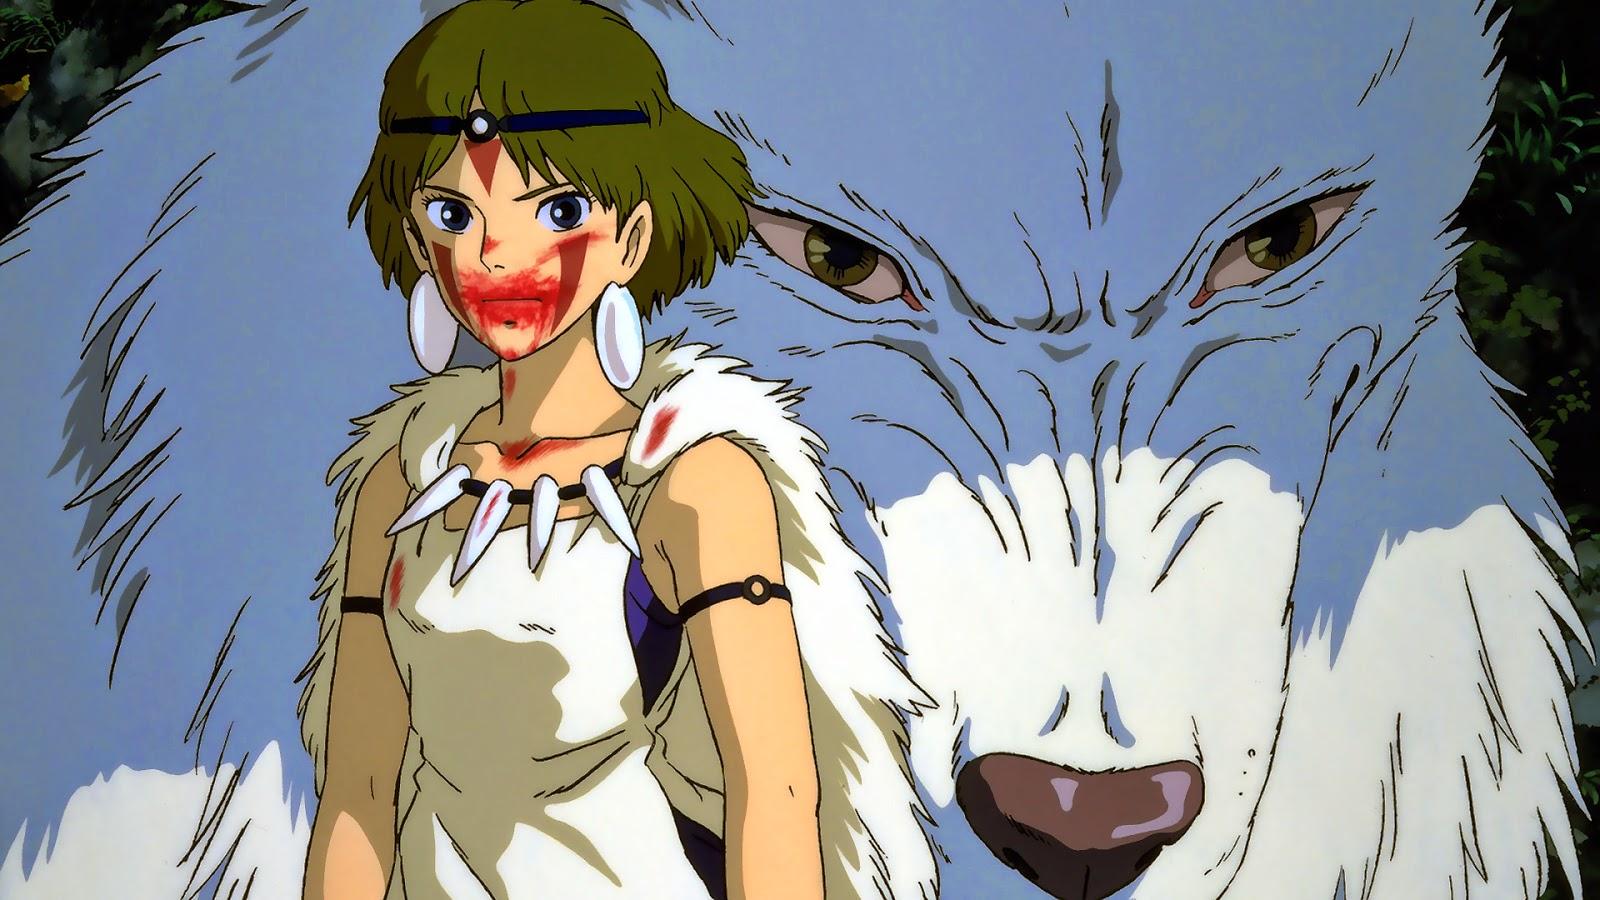 the-great-japanese-epic-from-studio-ghibli-princess-mononoke-1997-princess-mononoke